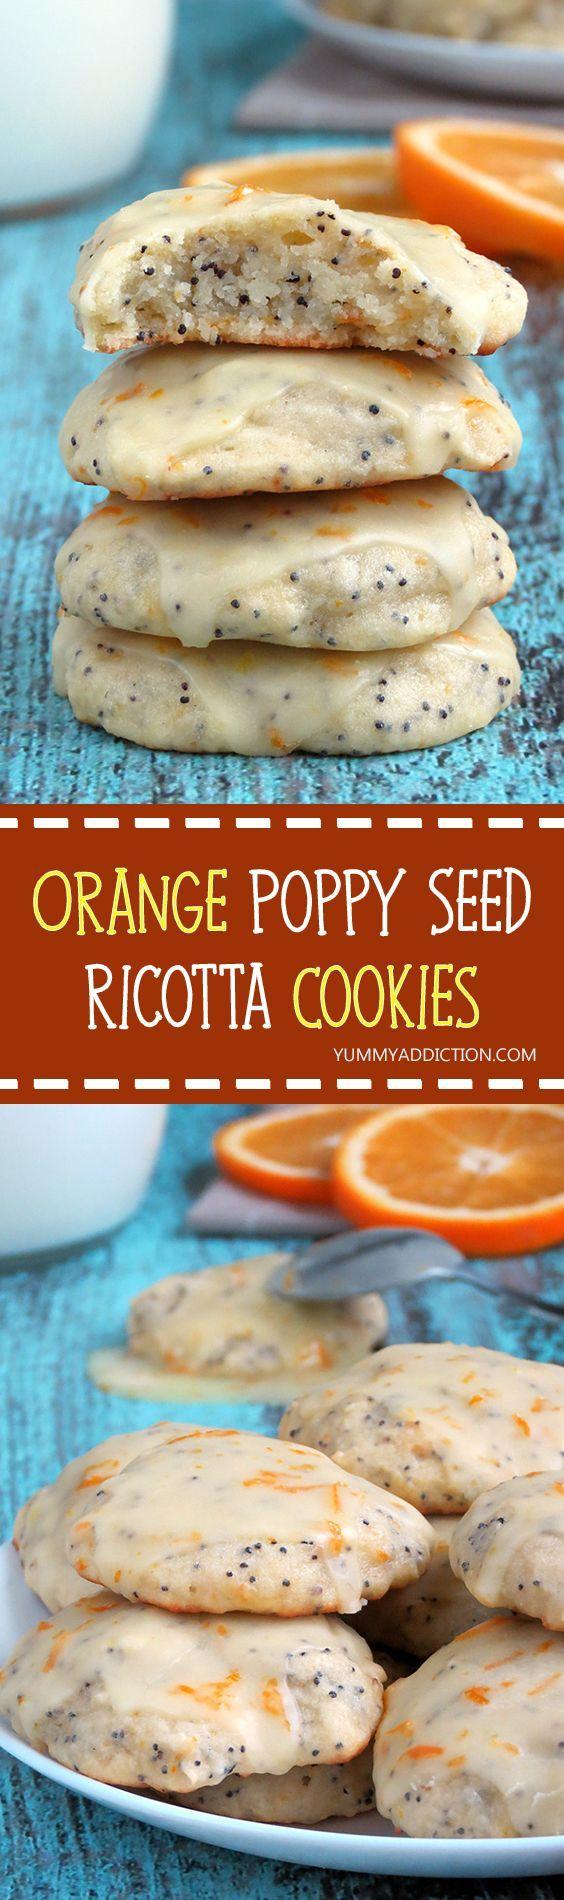 Vanilla and Cardamom flavored Orange Poppy Seed Ricotta Cookies | YummyAddiction.com